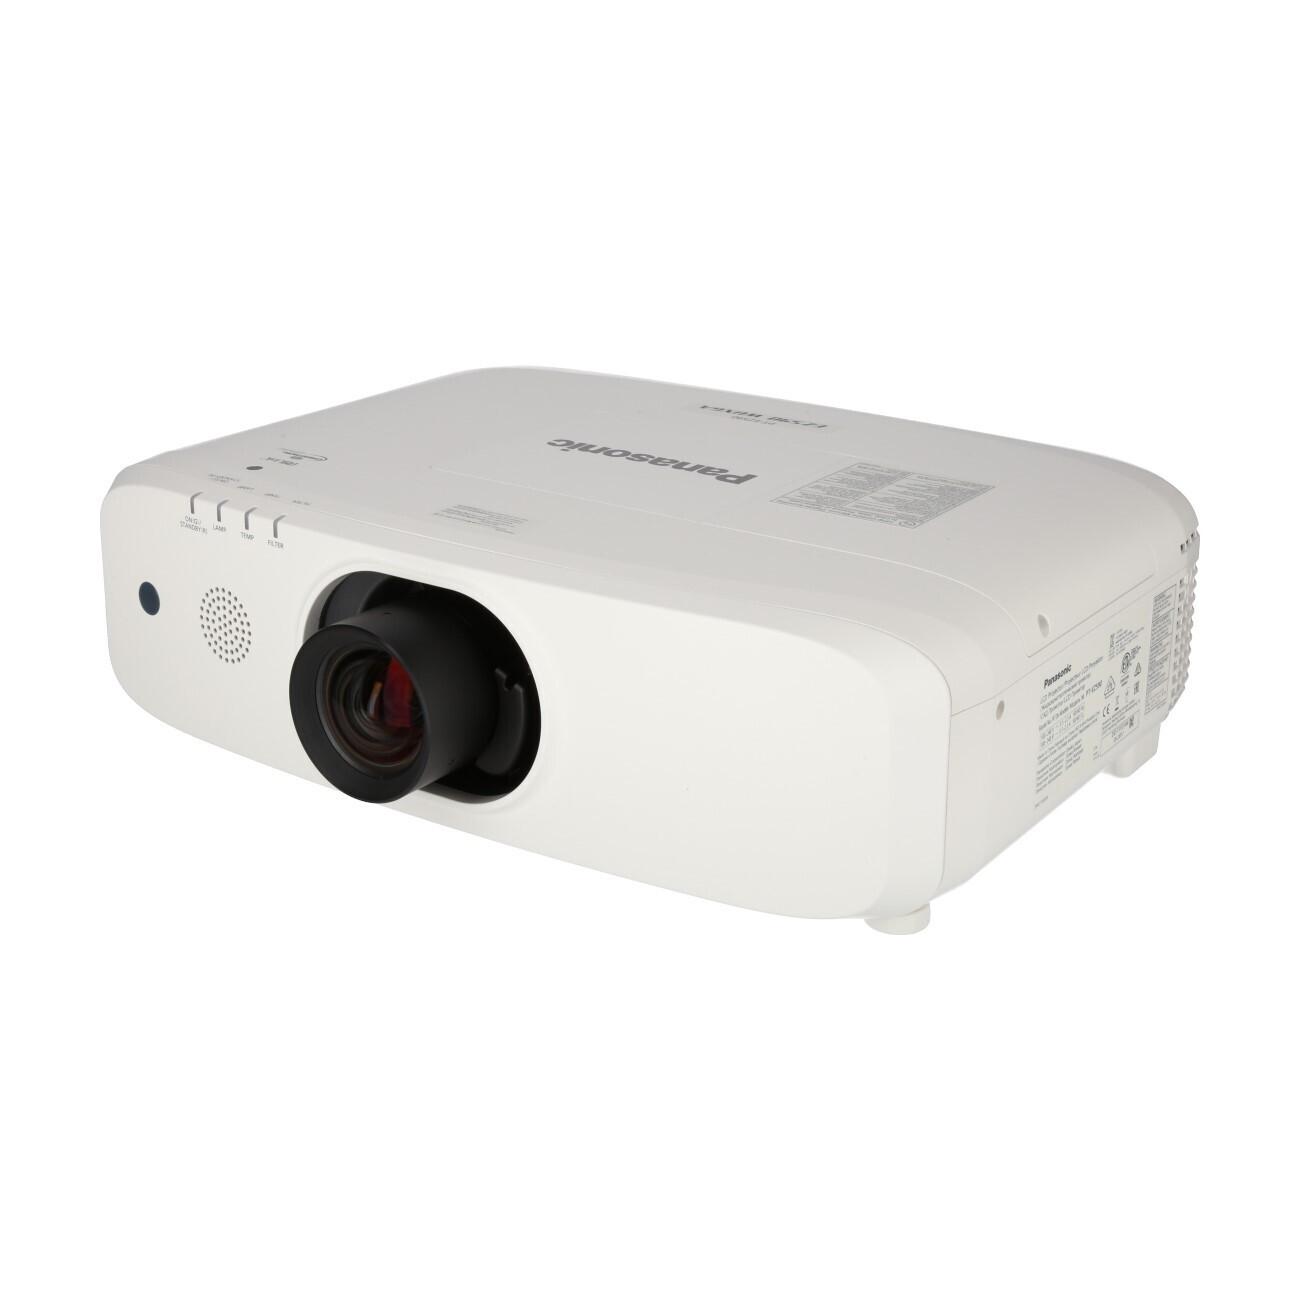 Panasonic PT-EZ590E incl. standard Lens